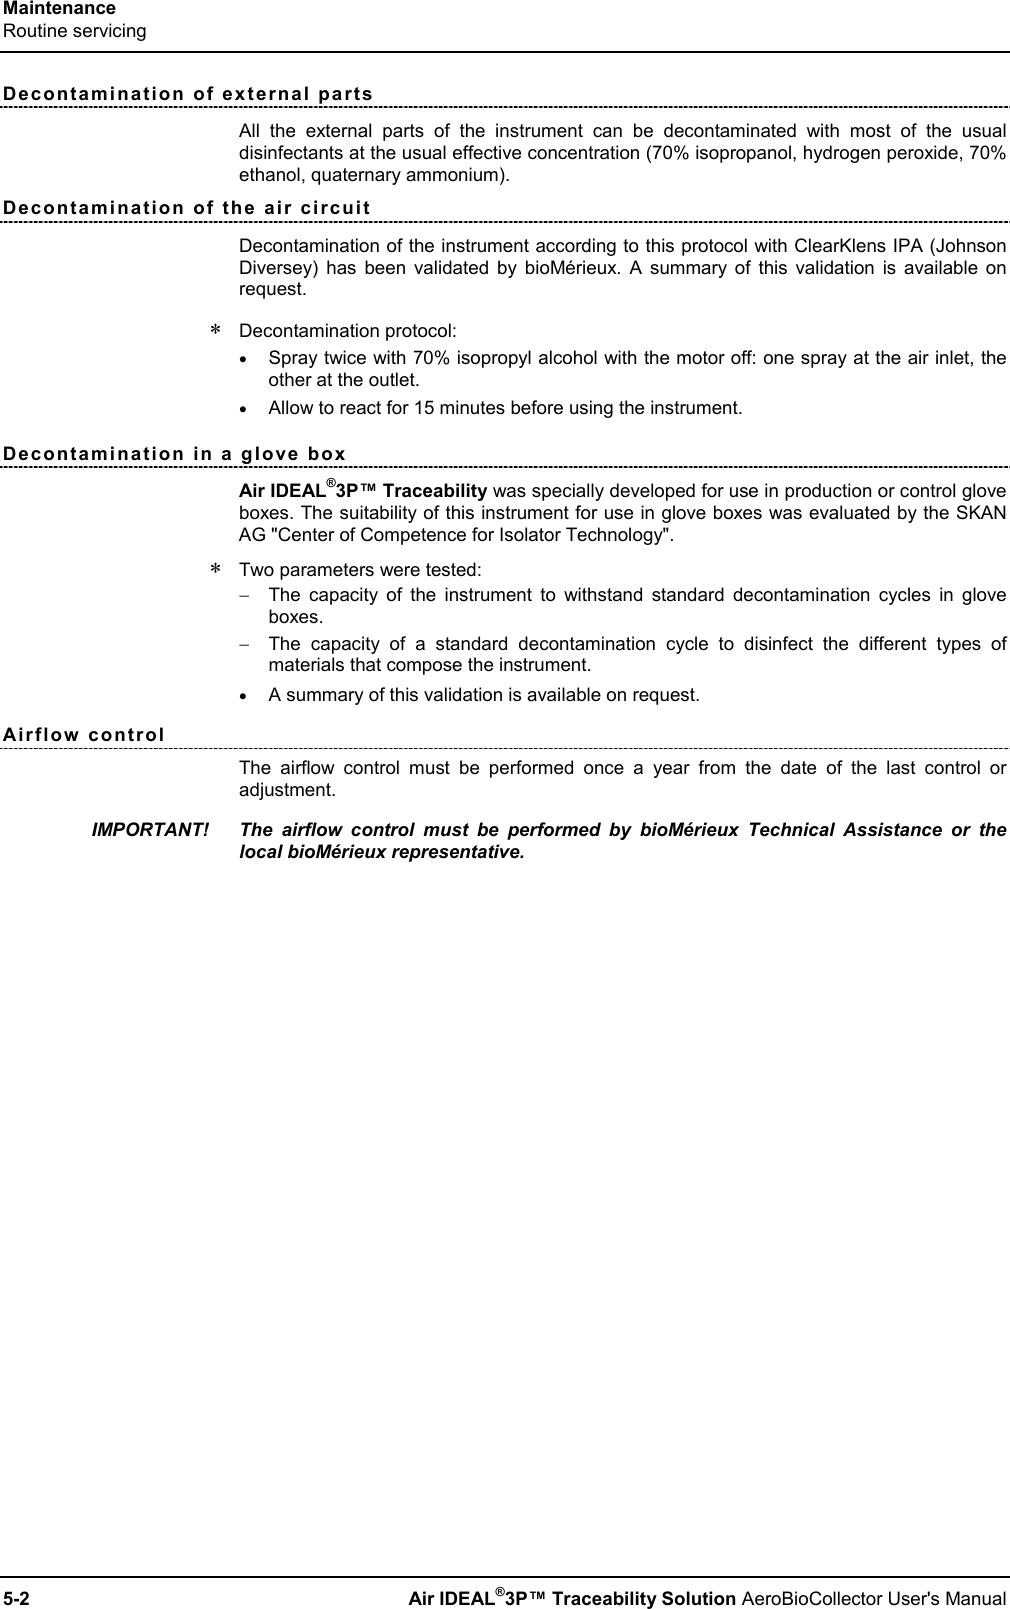 canon ixus 190 manual pdf